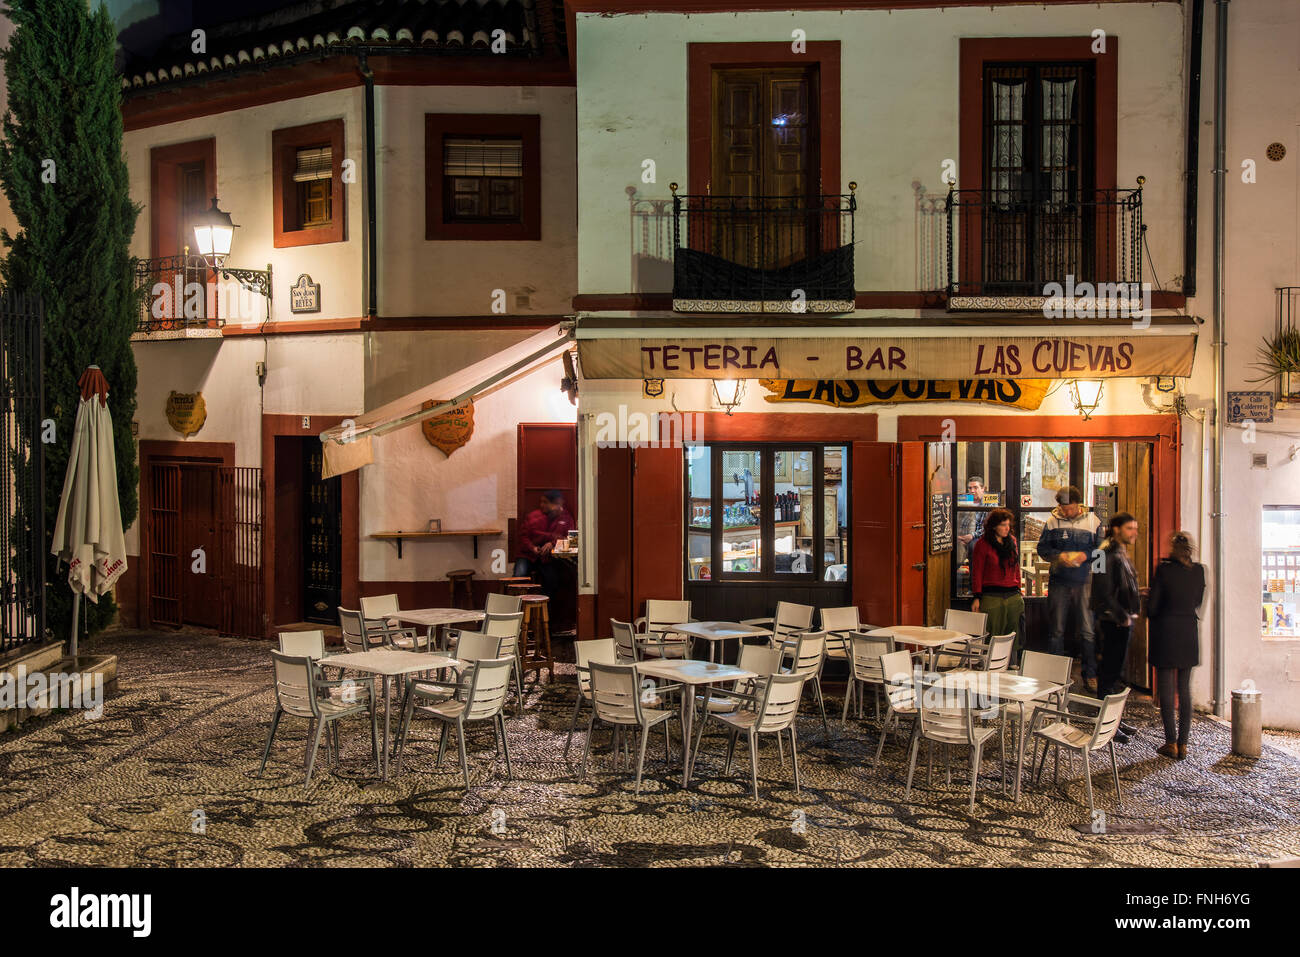 Nightlife atmosphere in the Albayzin quarter, Granada, Andalusia, Spain Stock Photo